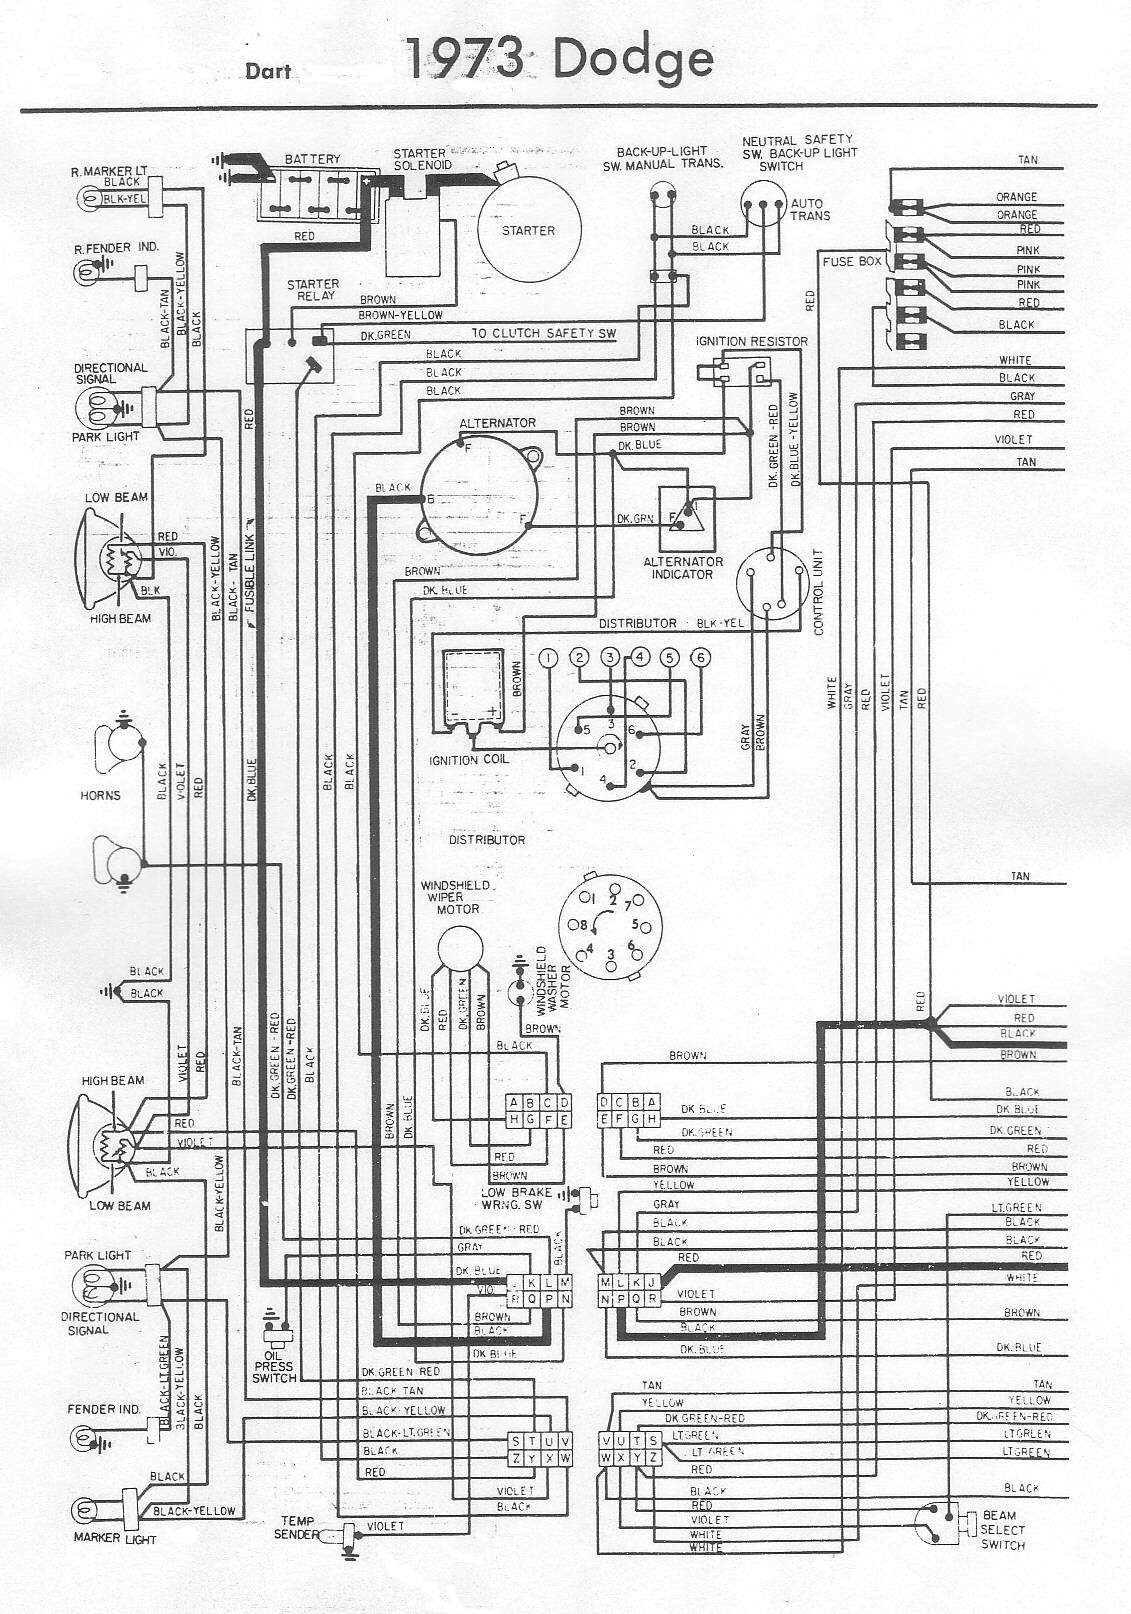 bn_0197] 73 cuda fuse panel diagram download diagram 73 cuda fuse box diagram house fuse box wiring diagram rous apan iness monoc dome mohammedshrine librar wiring 101